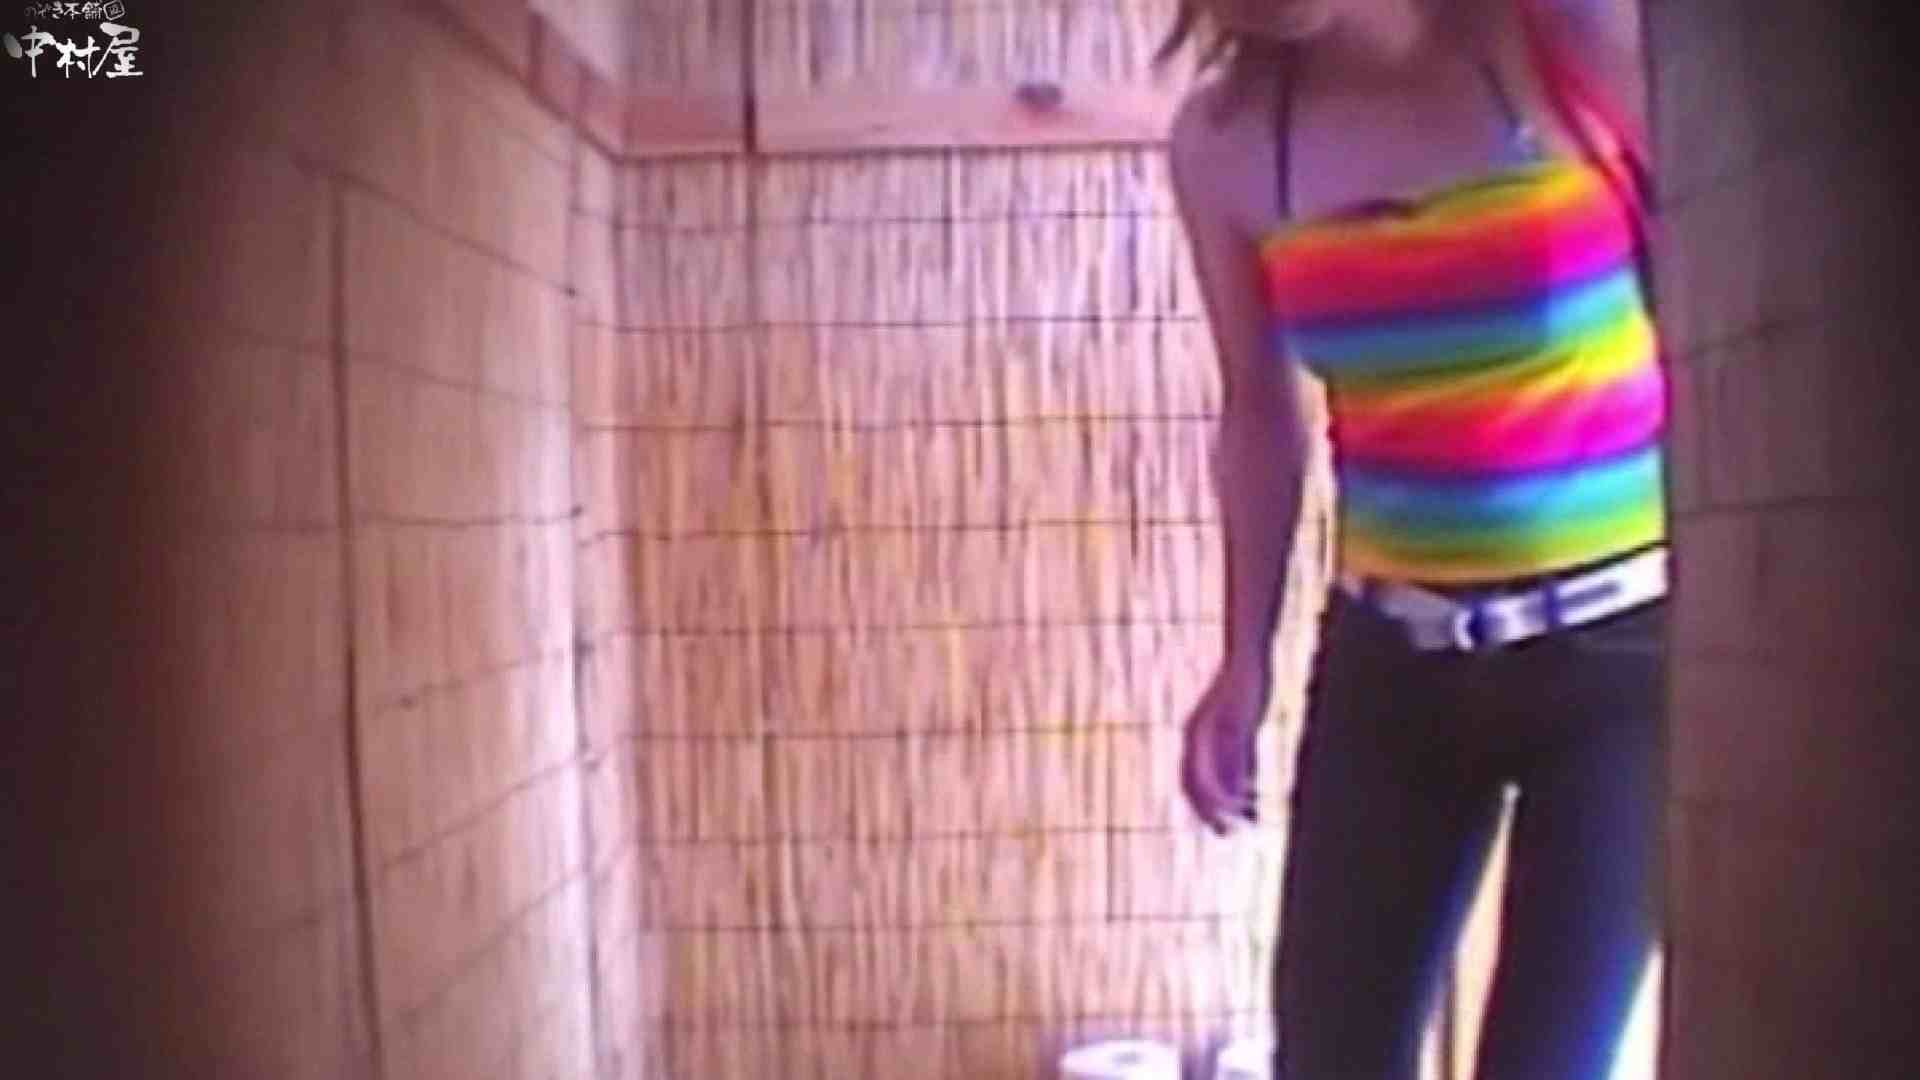 Summer beaches!Toilet peeping!Vol.03 日焼け AV無料動画キャプチャ 83画像 77